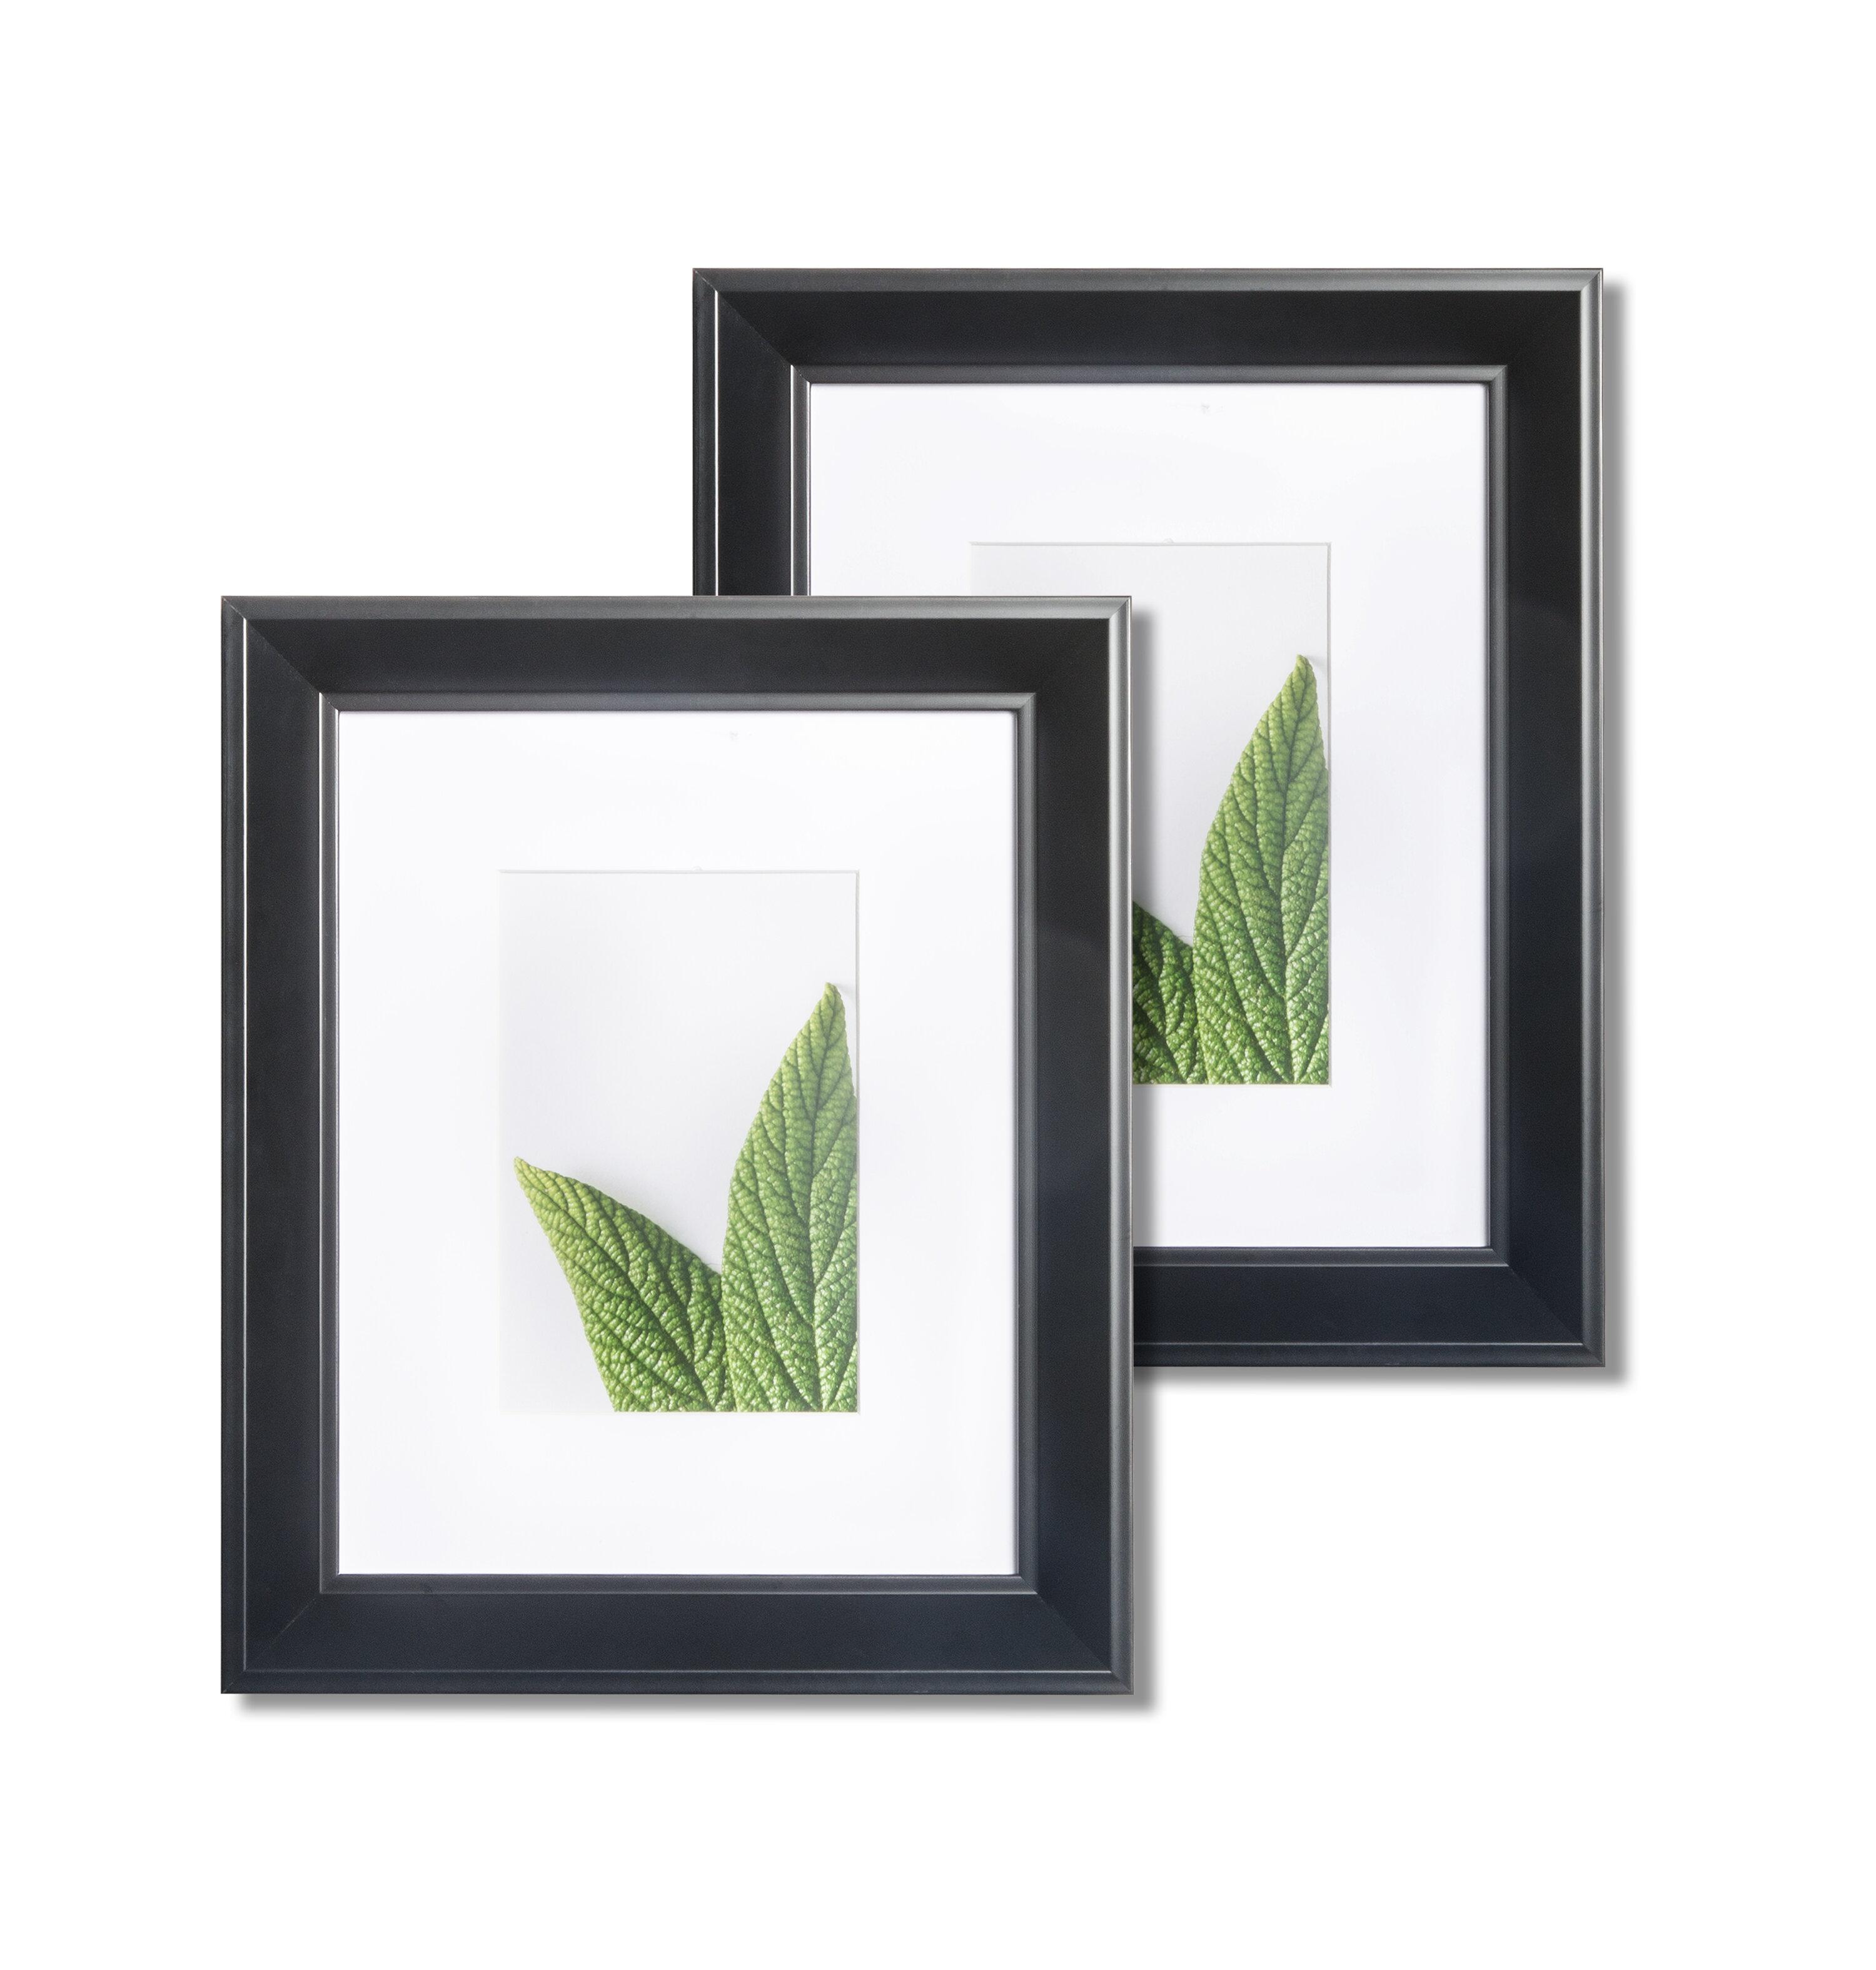 Kitchen Cabinet Warehouse Manassas Va: Fleur De Lis Living Manassas Wide Bevel Picture Frame